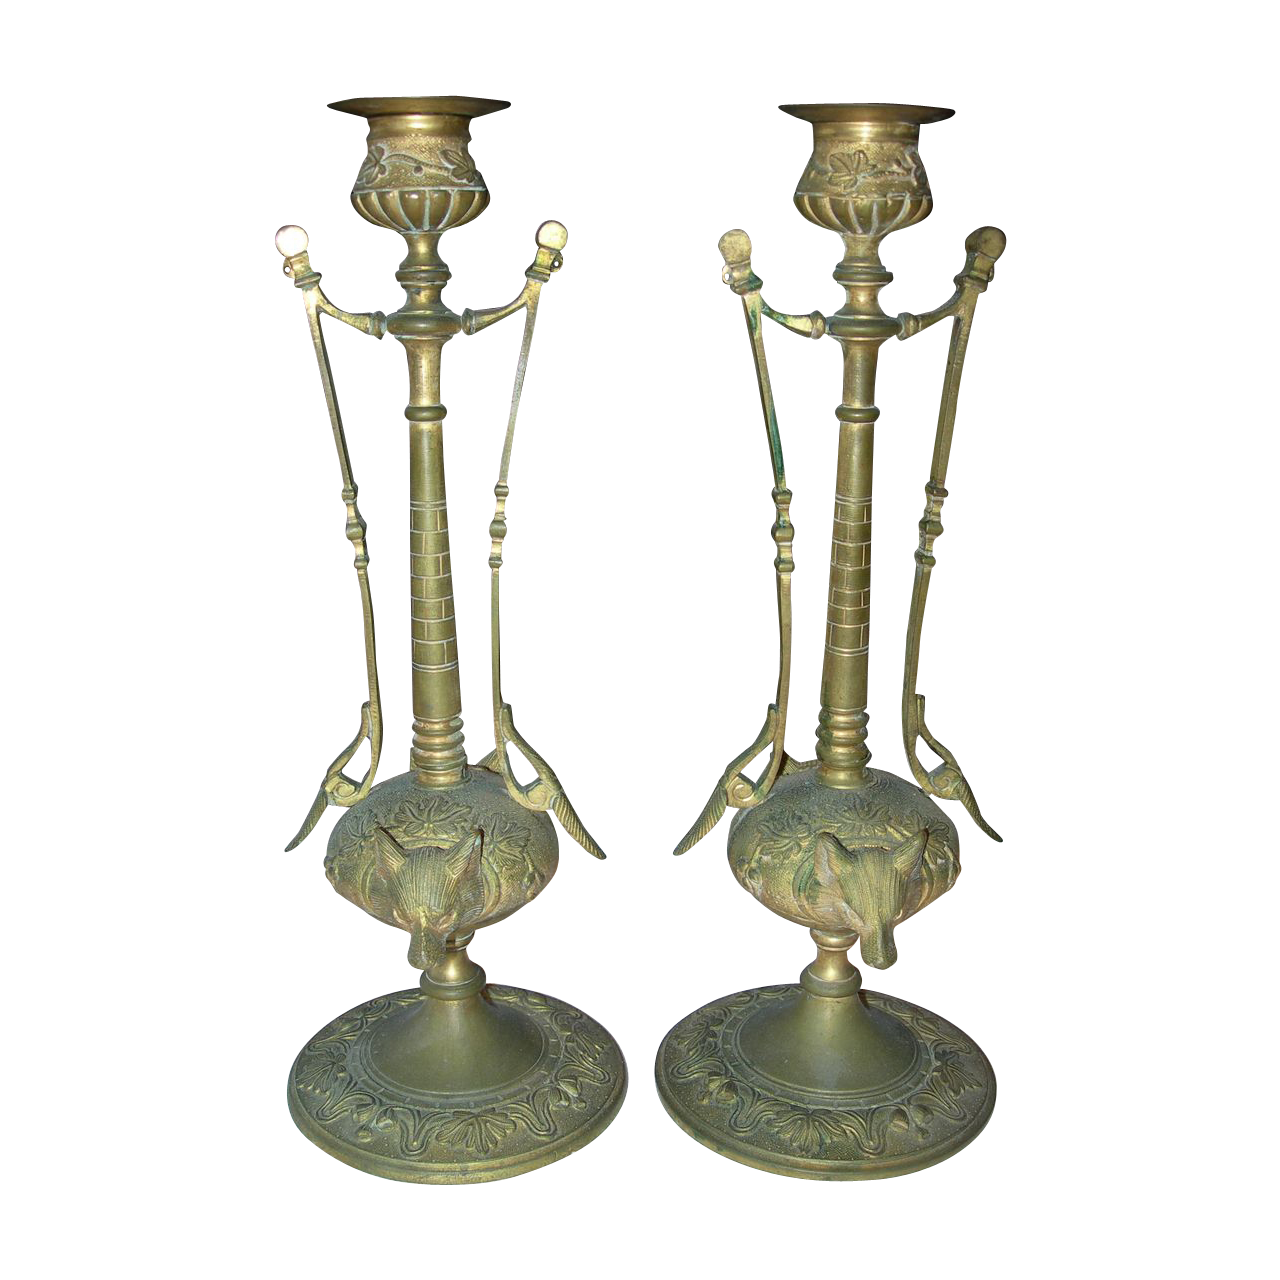 Pair of Antique Art Nouveau French Gilt Bronze Candlesticks